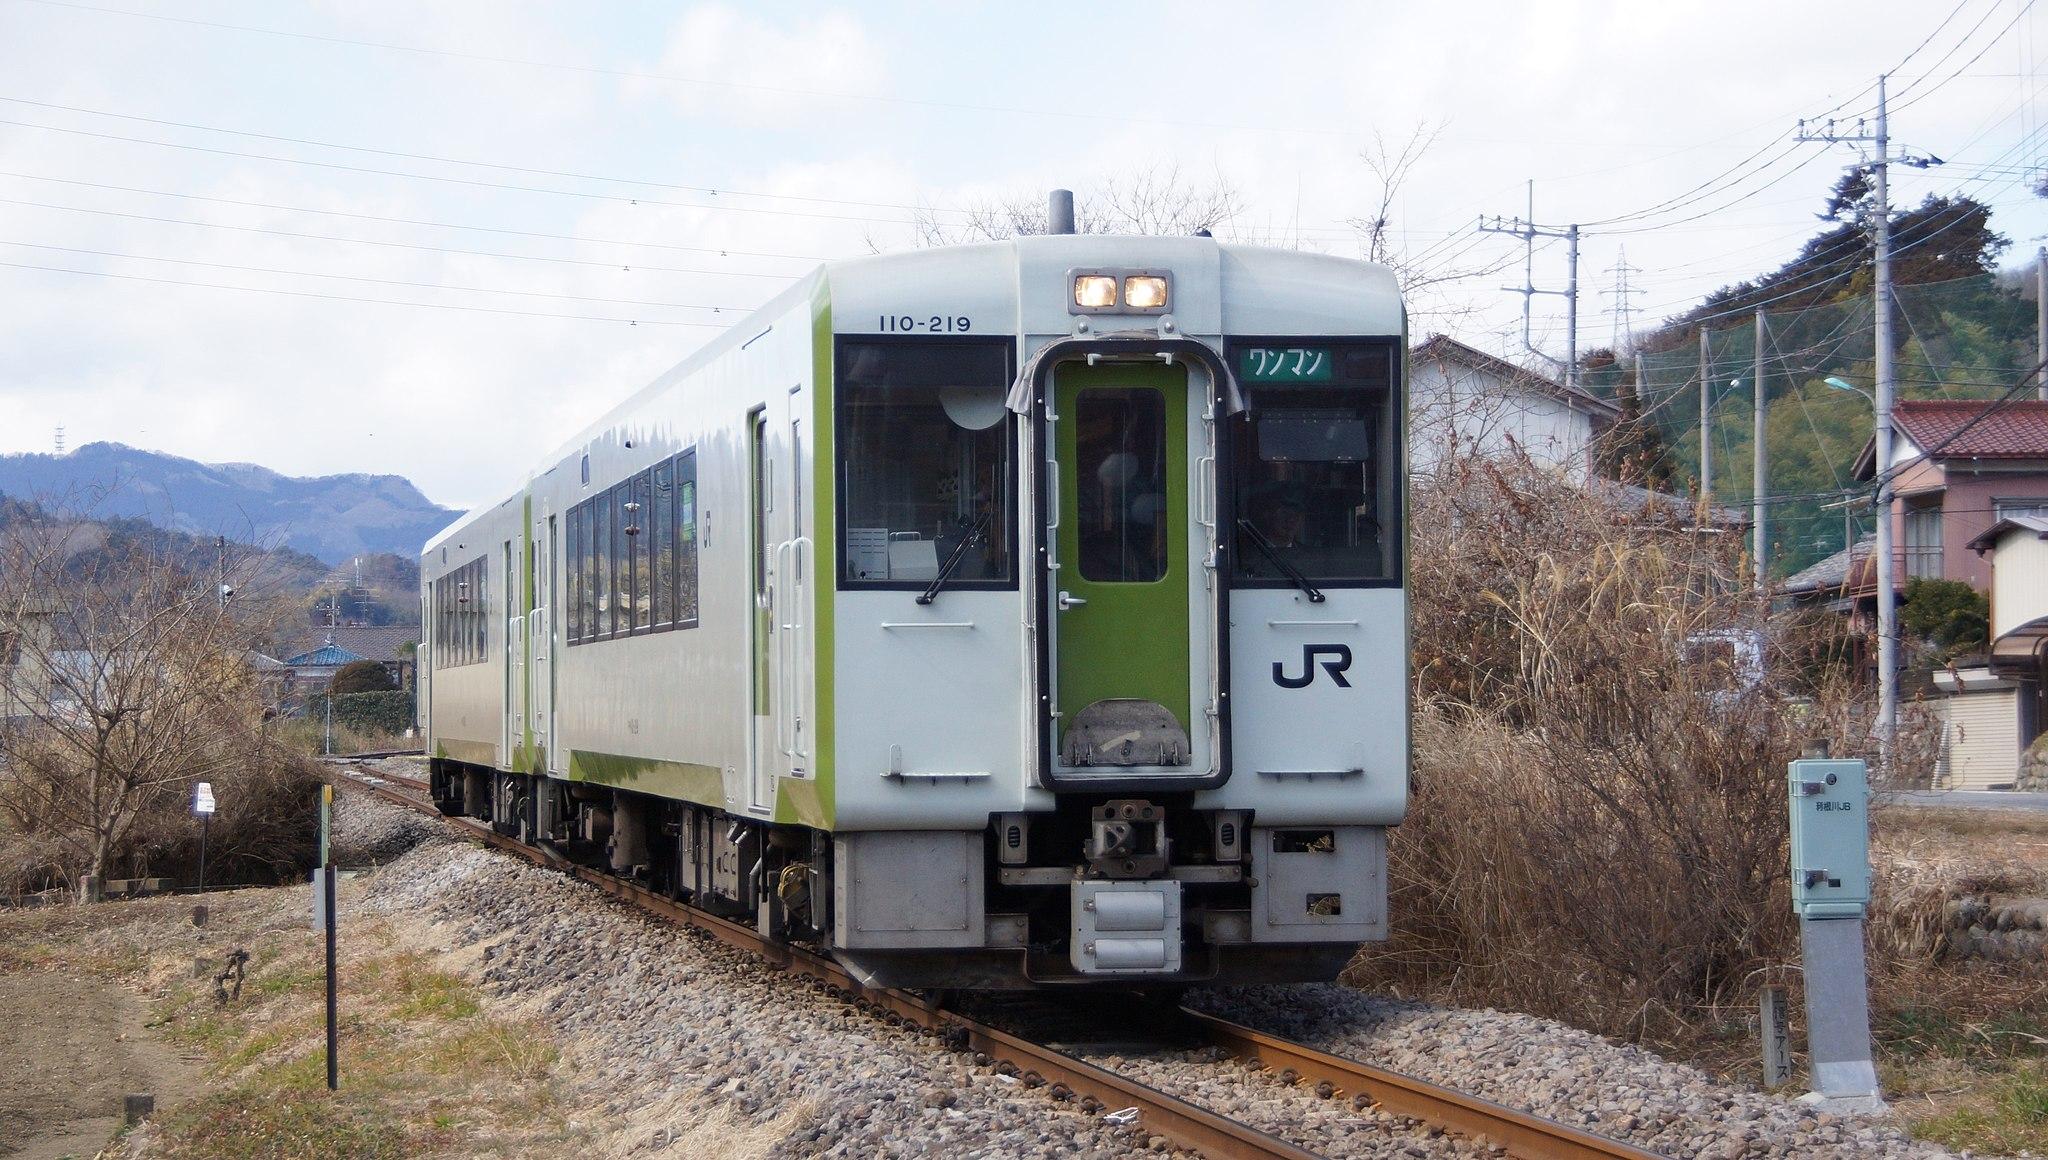 Hachiko_Line_KiHa_110-219_south_of_Takezawa_Station_20170211.jpg